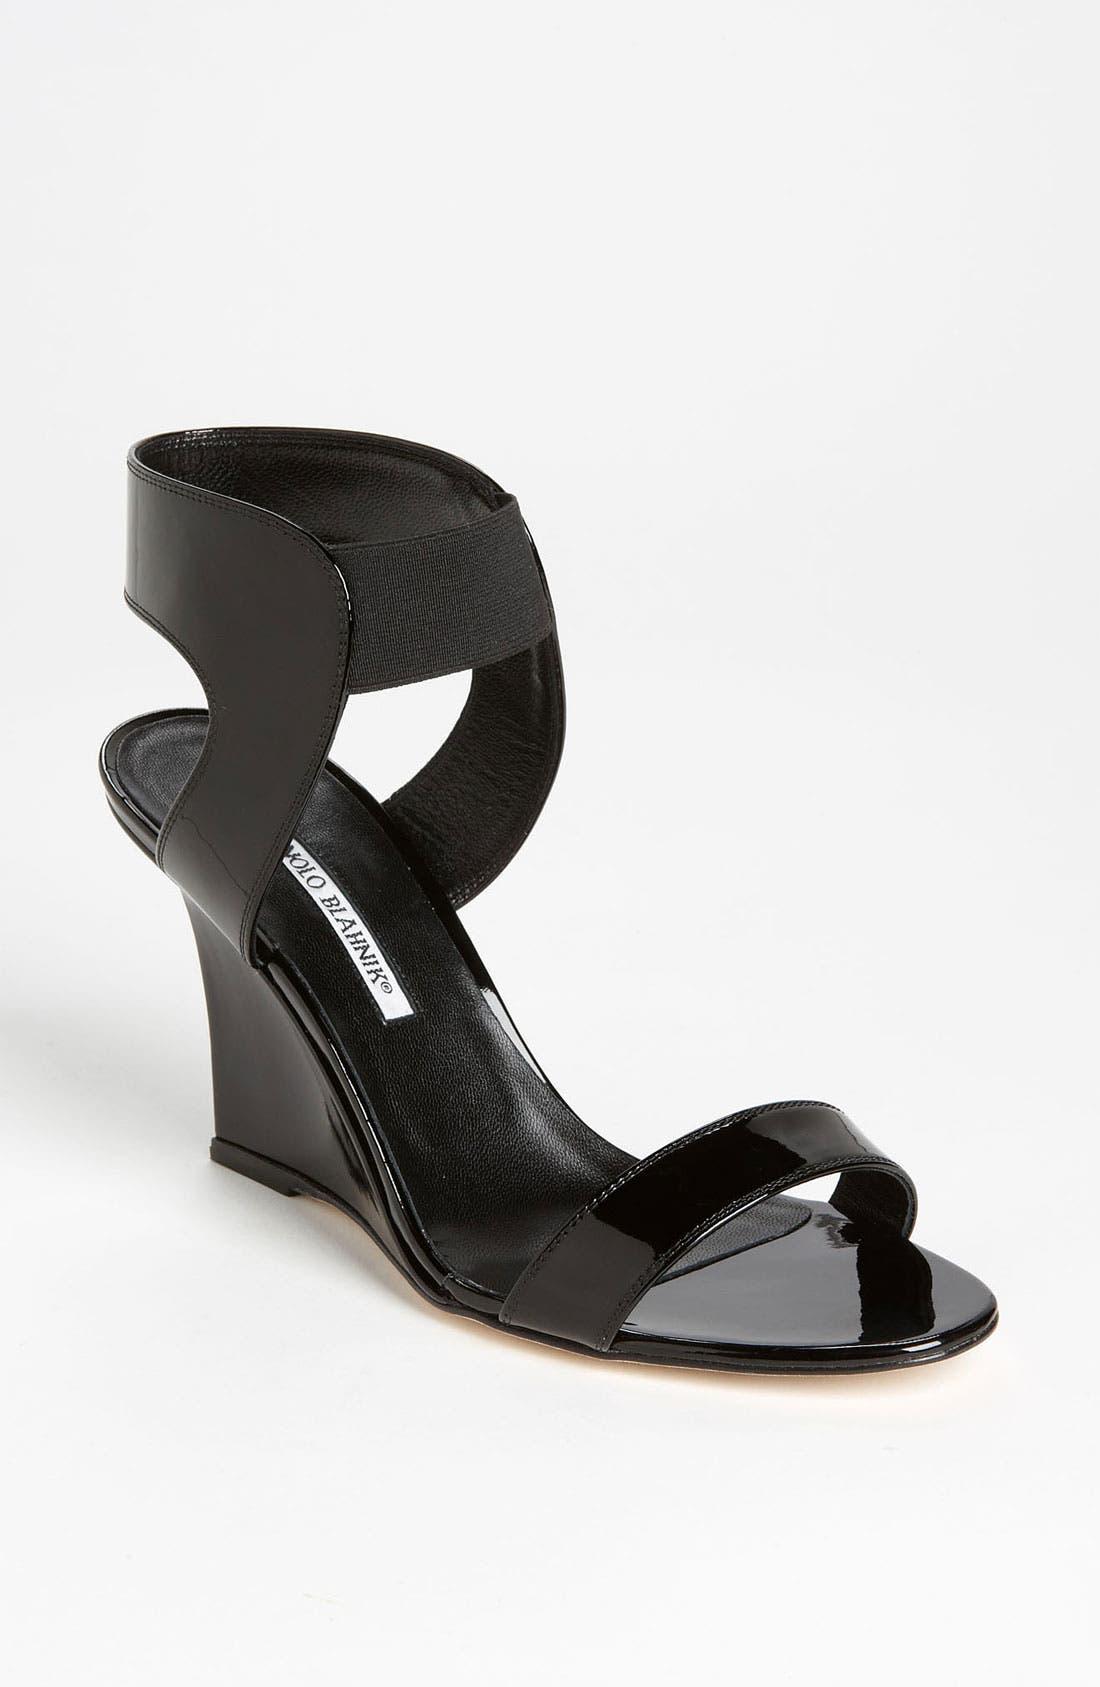 Alternate Image 1 Selected - Manolo Blahnik 'Pepe' Wedge Sandal